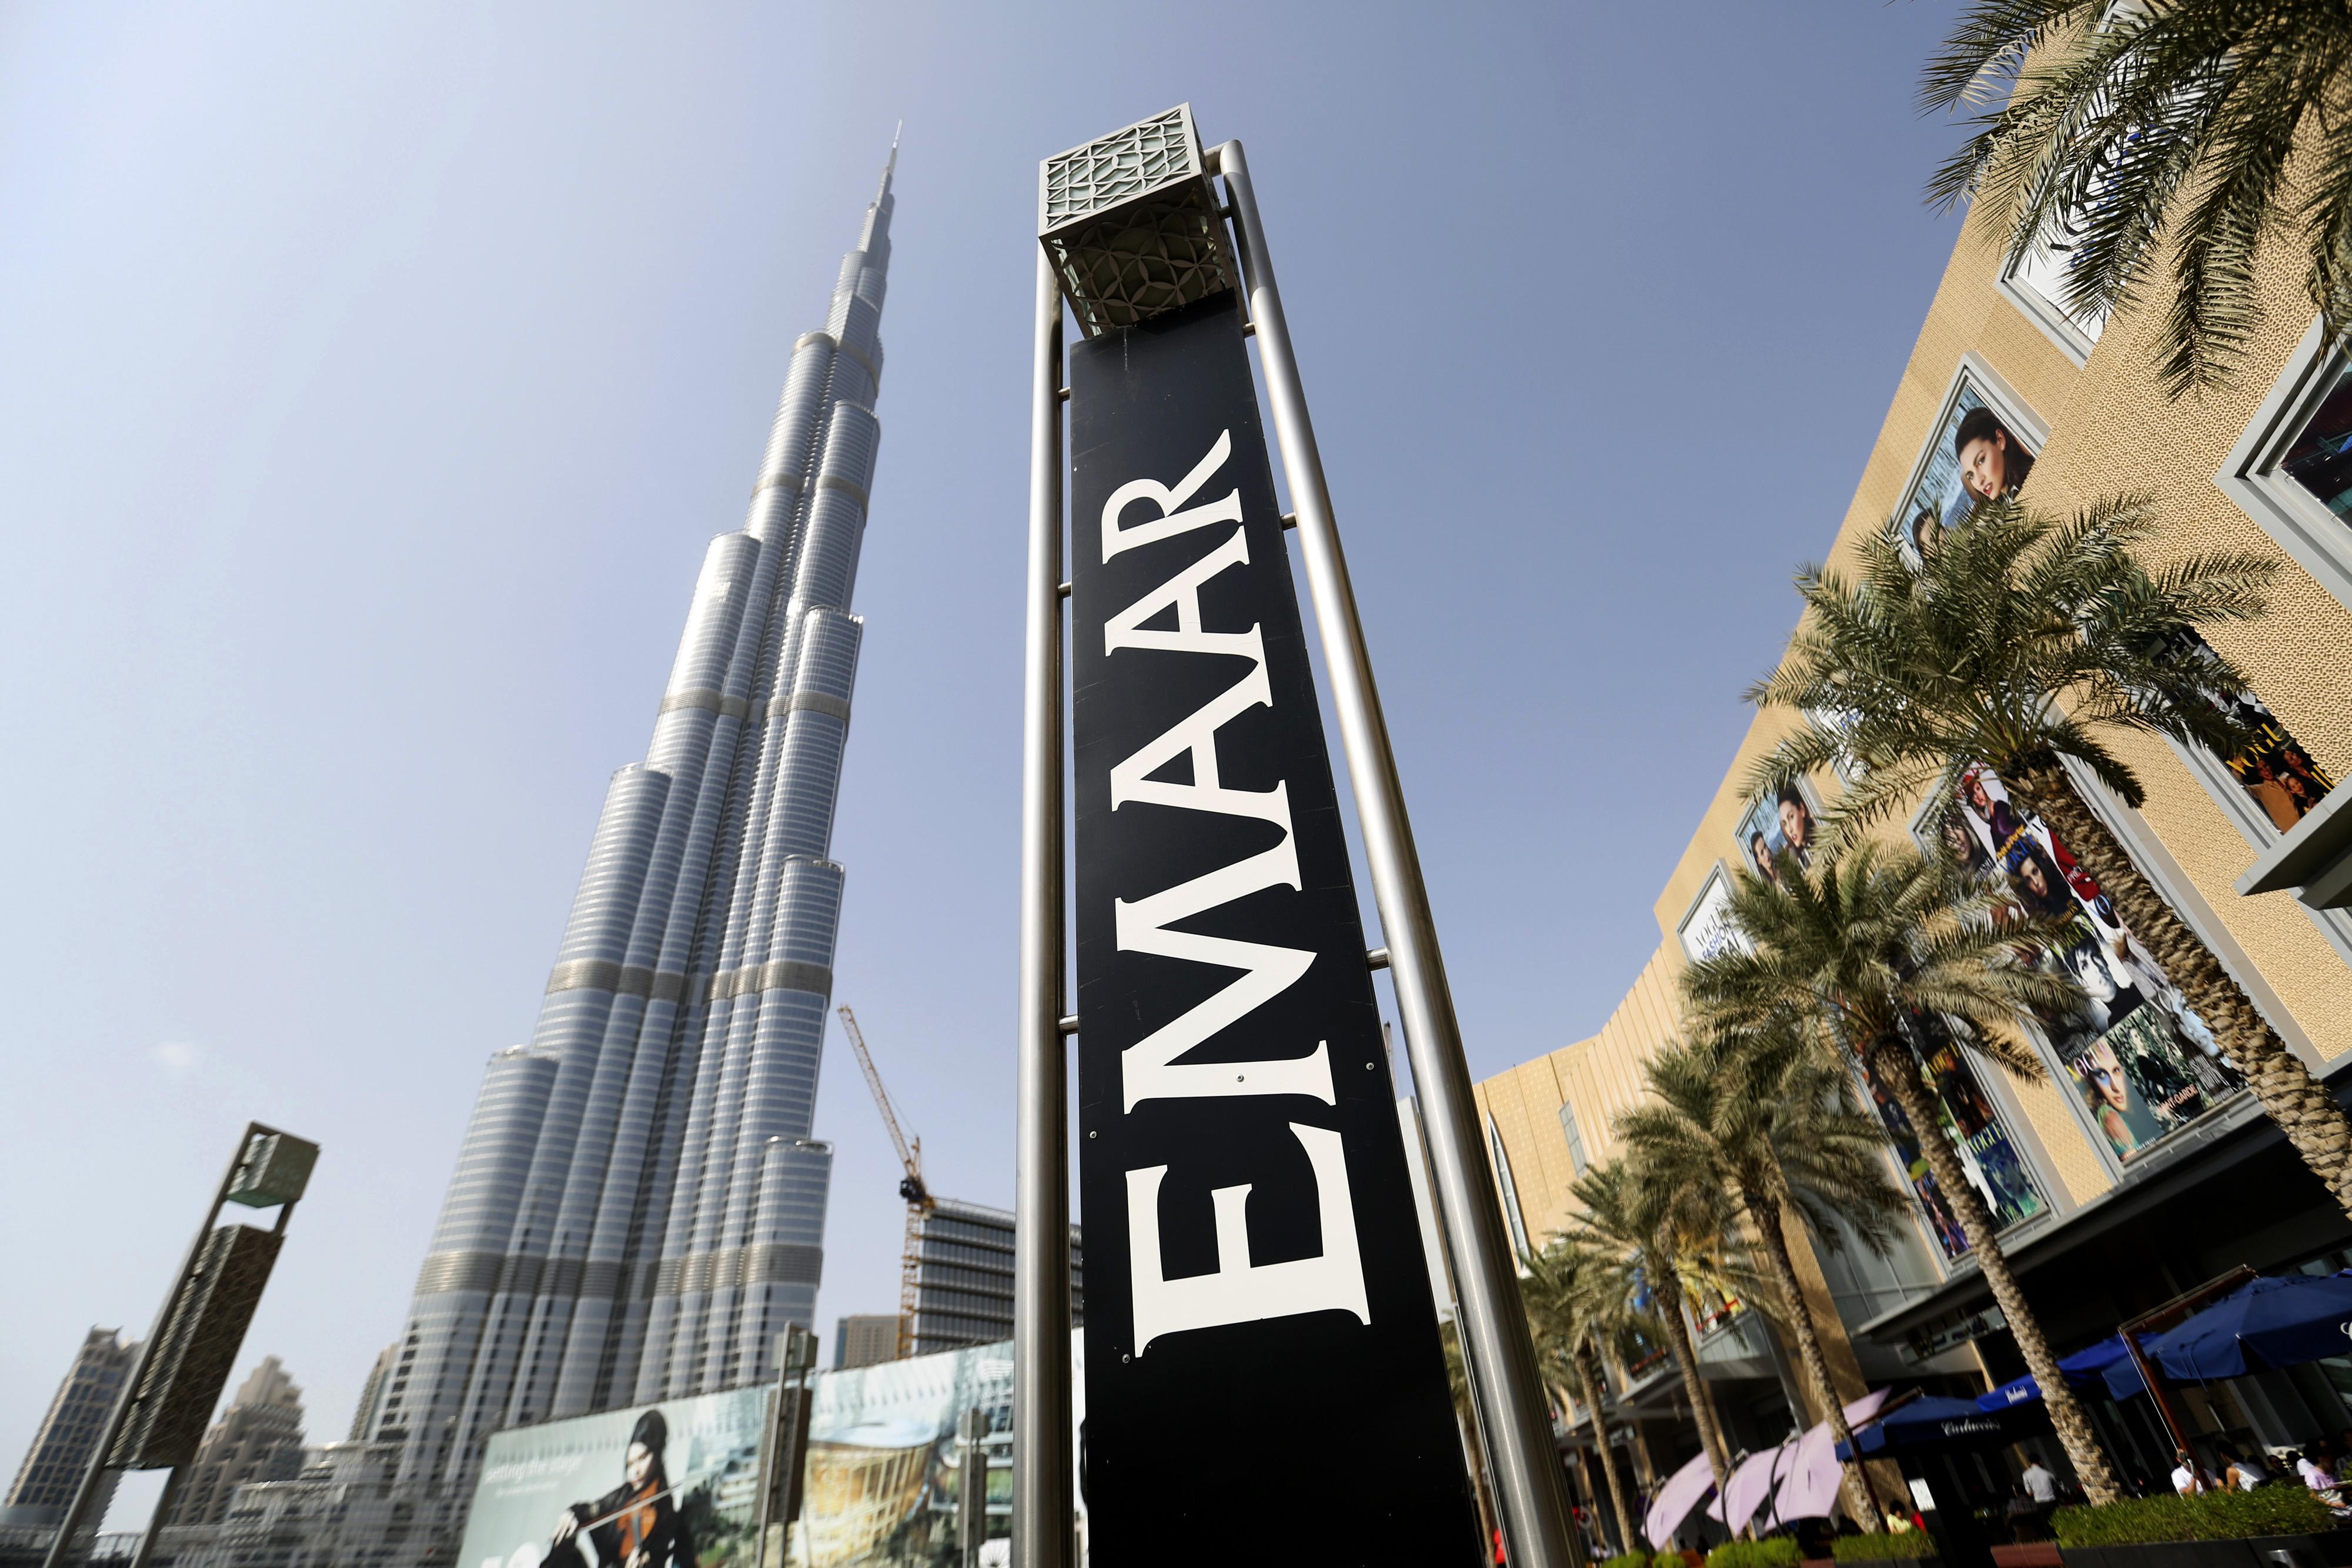 Dubai's Emaar made `severe' cuts fearing tough 2016 ...